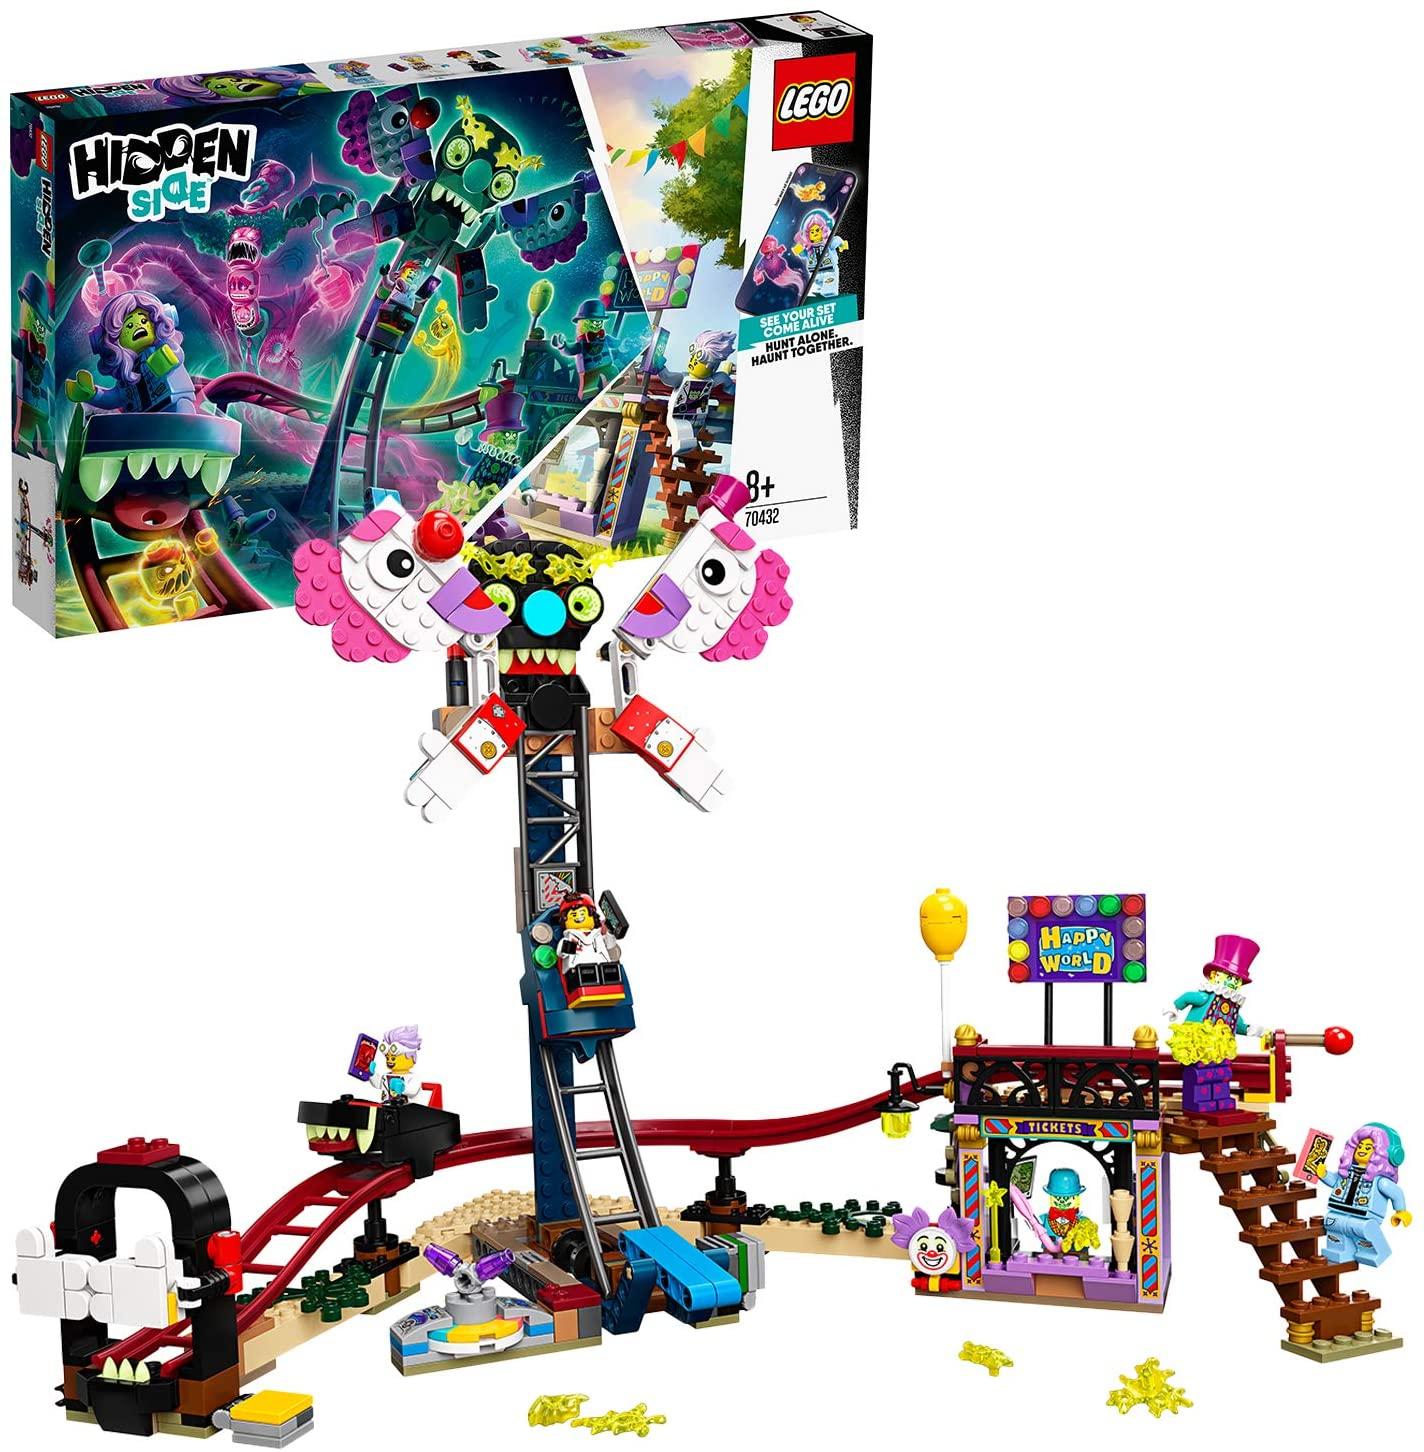 LEGO Hidden Side 70432 Haunted Fairground £36 delivered at Amazon